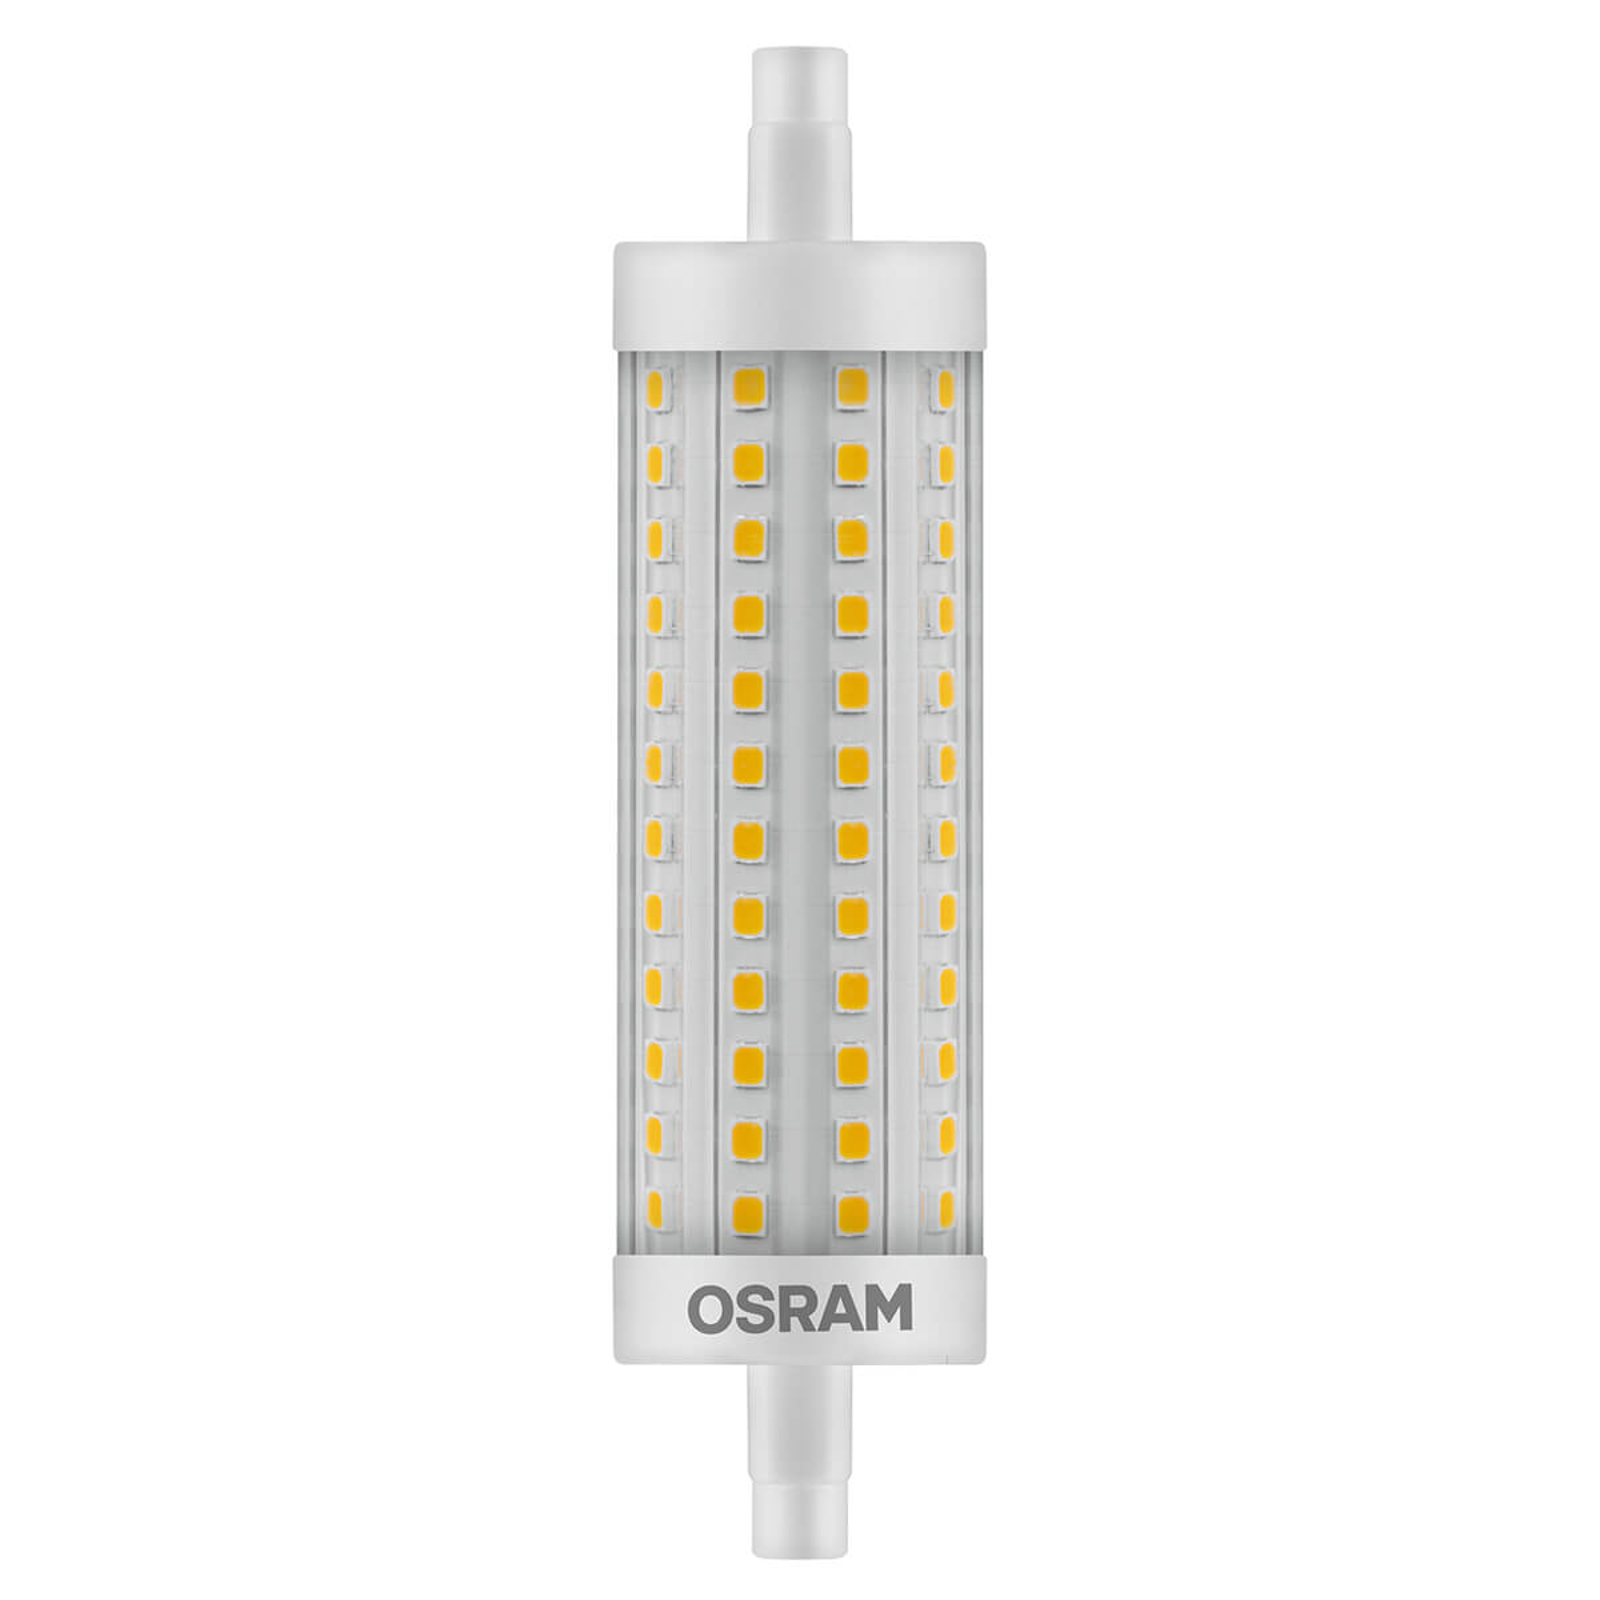 OSRAM LED-stav R7s 15 W varmhvit 2000 lm